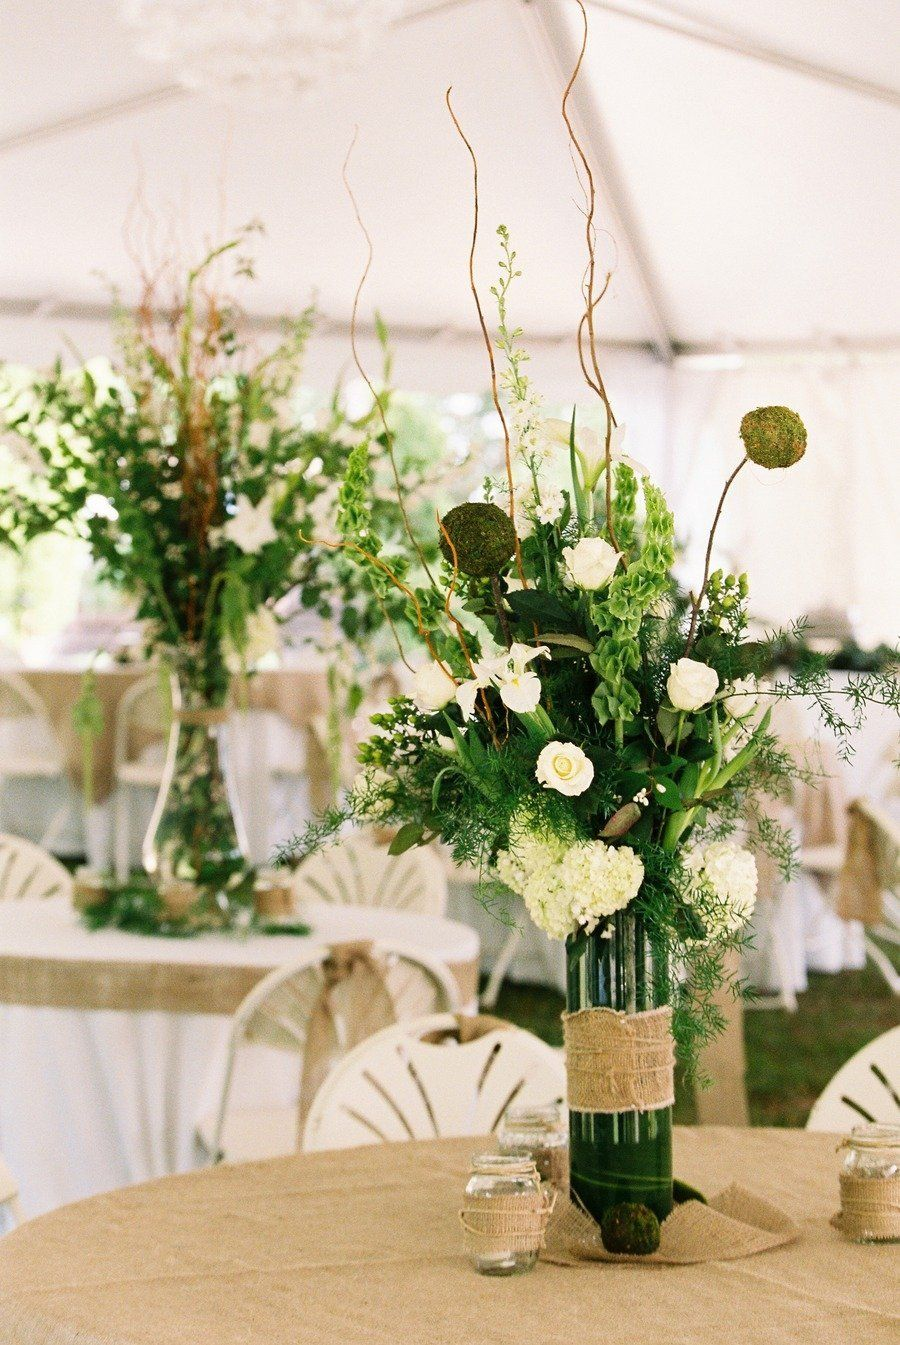 #centerpiece Photography by virgilbunao.com  Read more - http://www.stylemepretty.com/2012/08/27/backyard-sumter-wedding-from-virgil-bunao-fine-art-weddings/